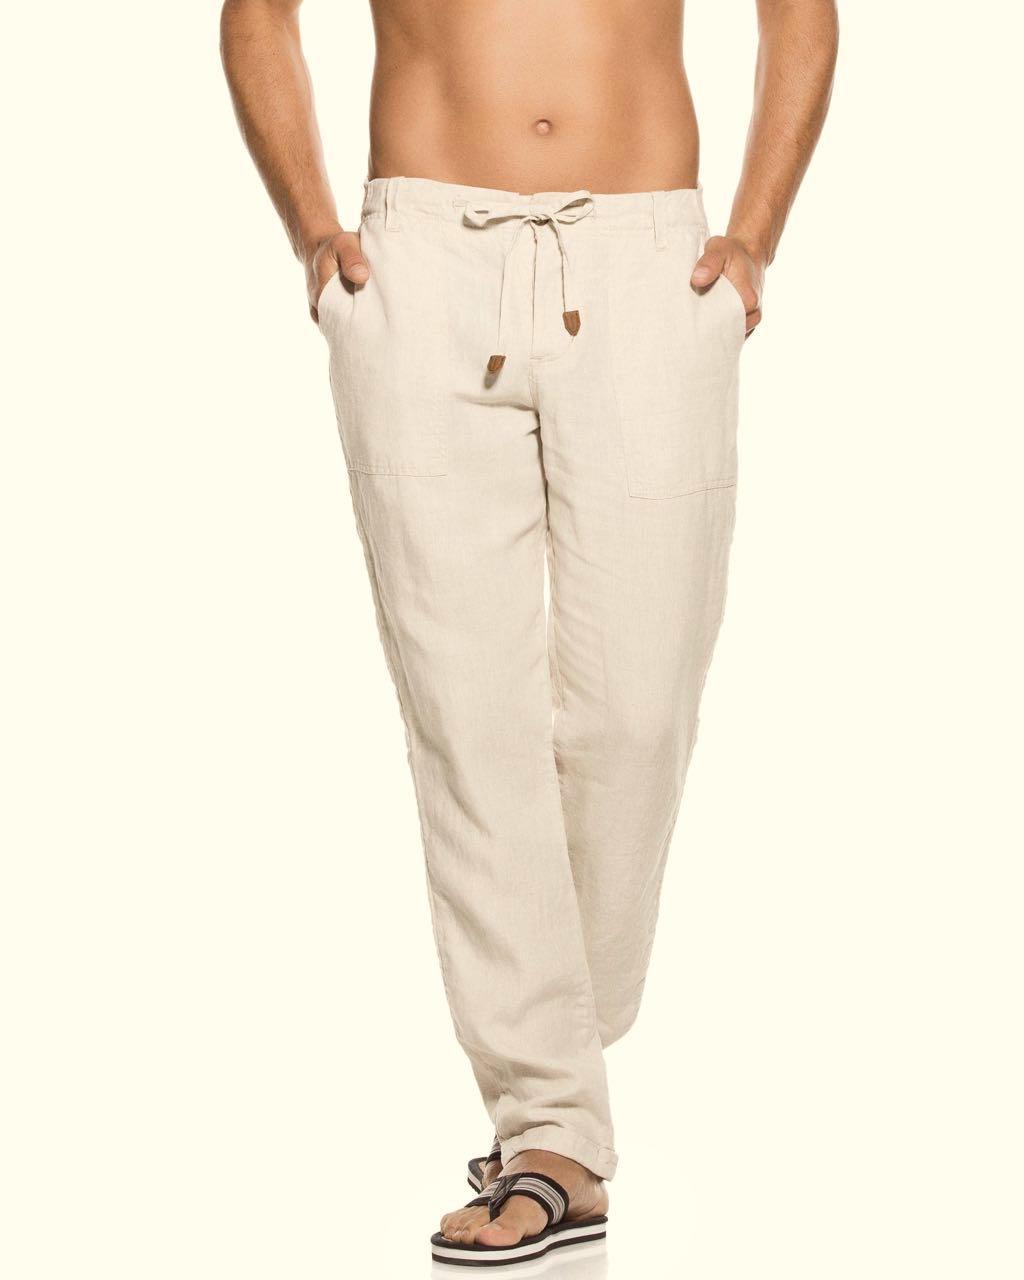 50f48684a1 OndadeMar Men's Linen Pants Light Beige PTH010/SELS  Buy Online